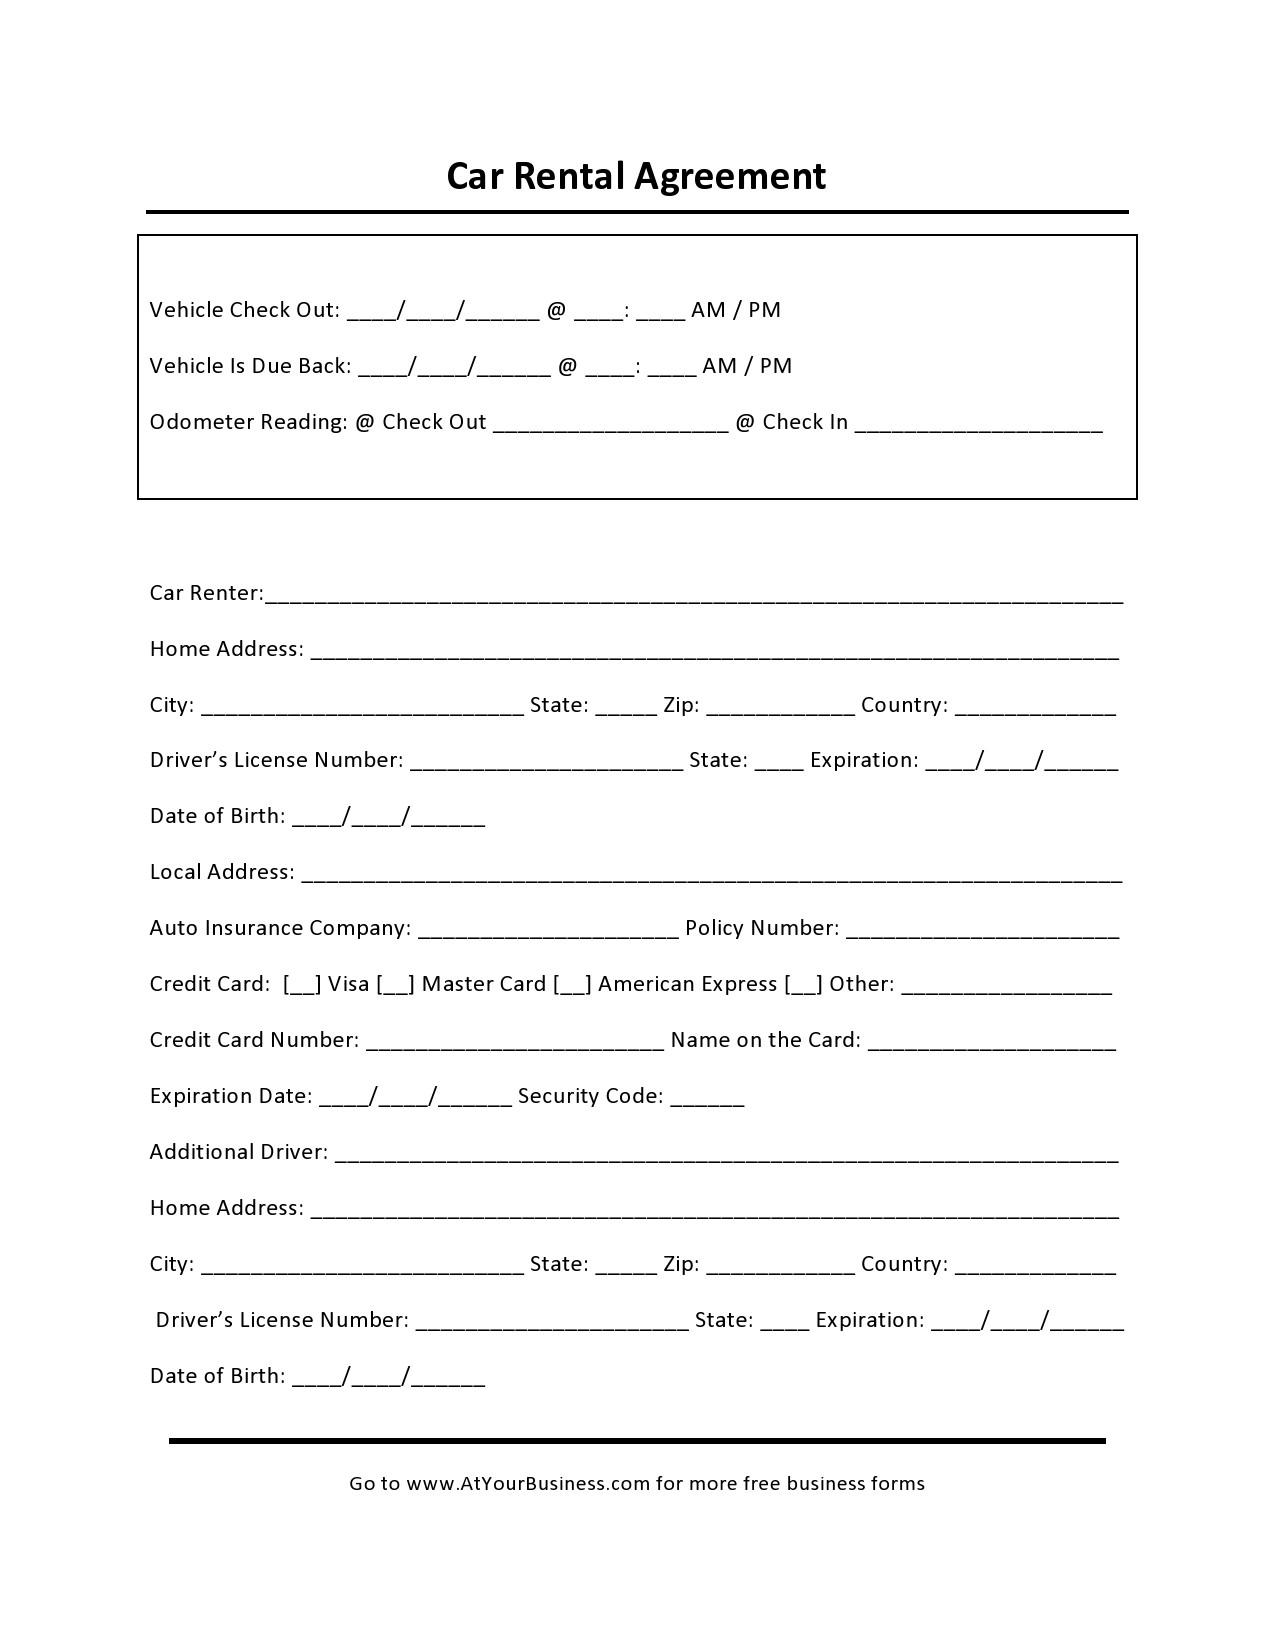 Free car rental agreement 35